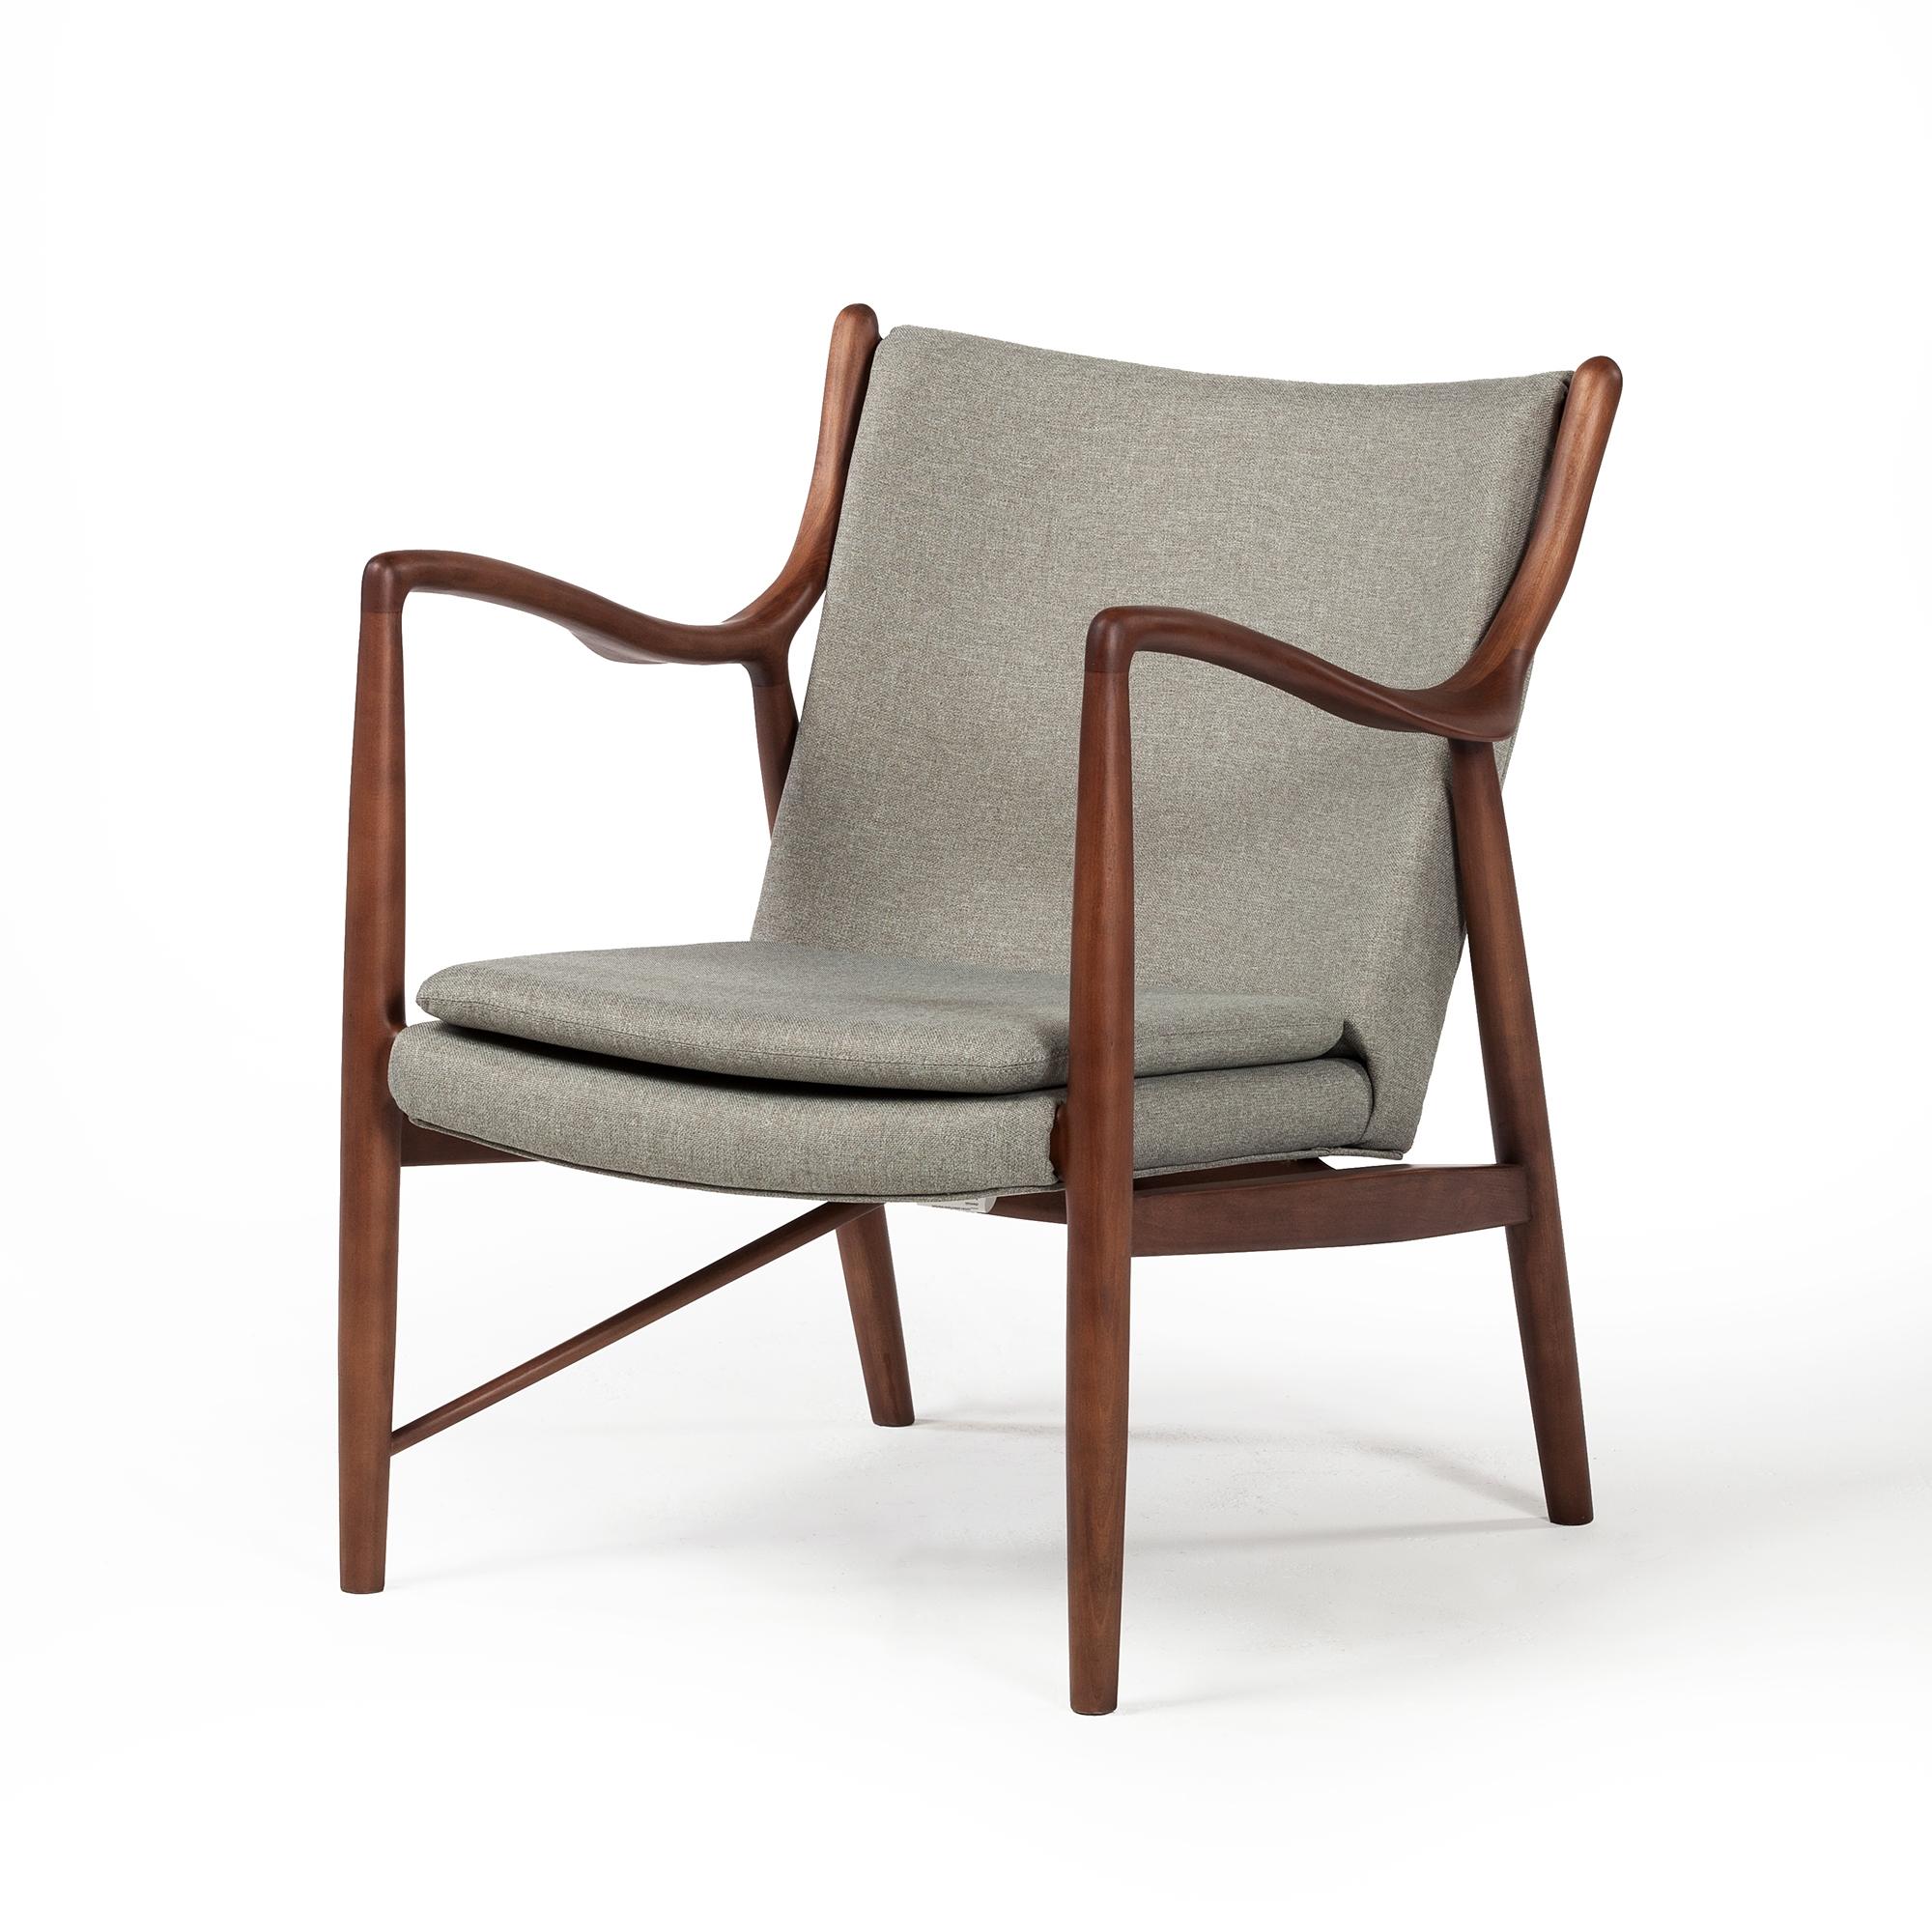 Finn juhl inspired 45 chair walnut frame in grey